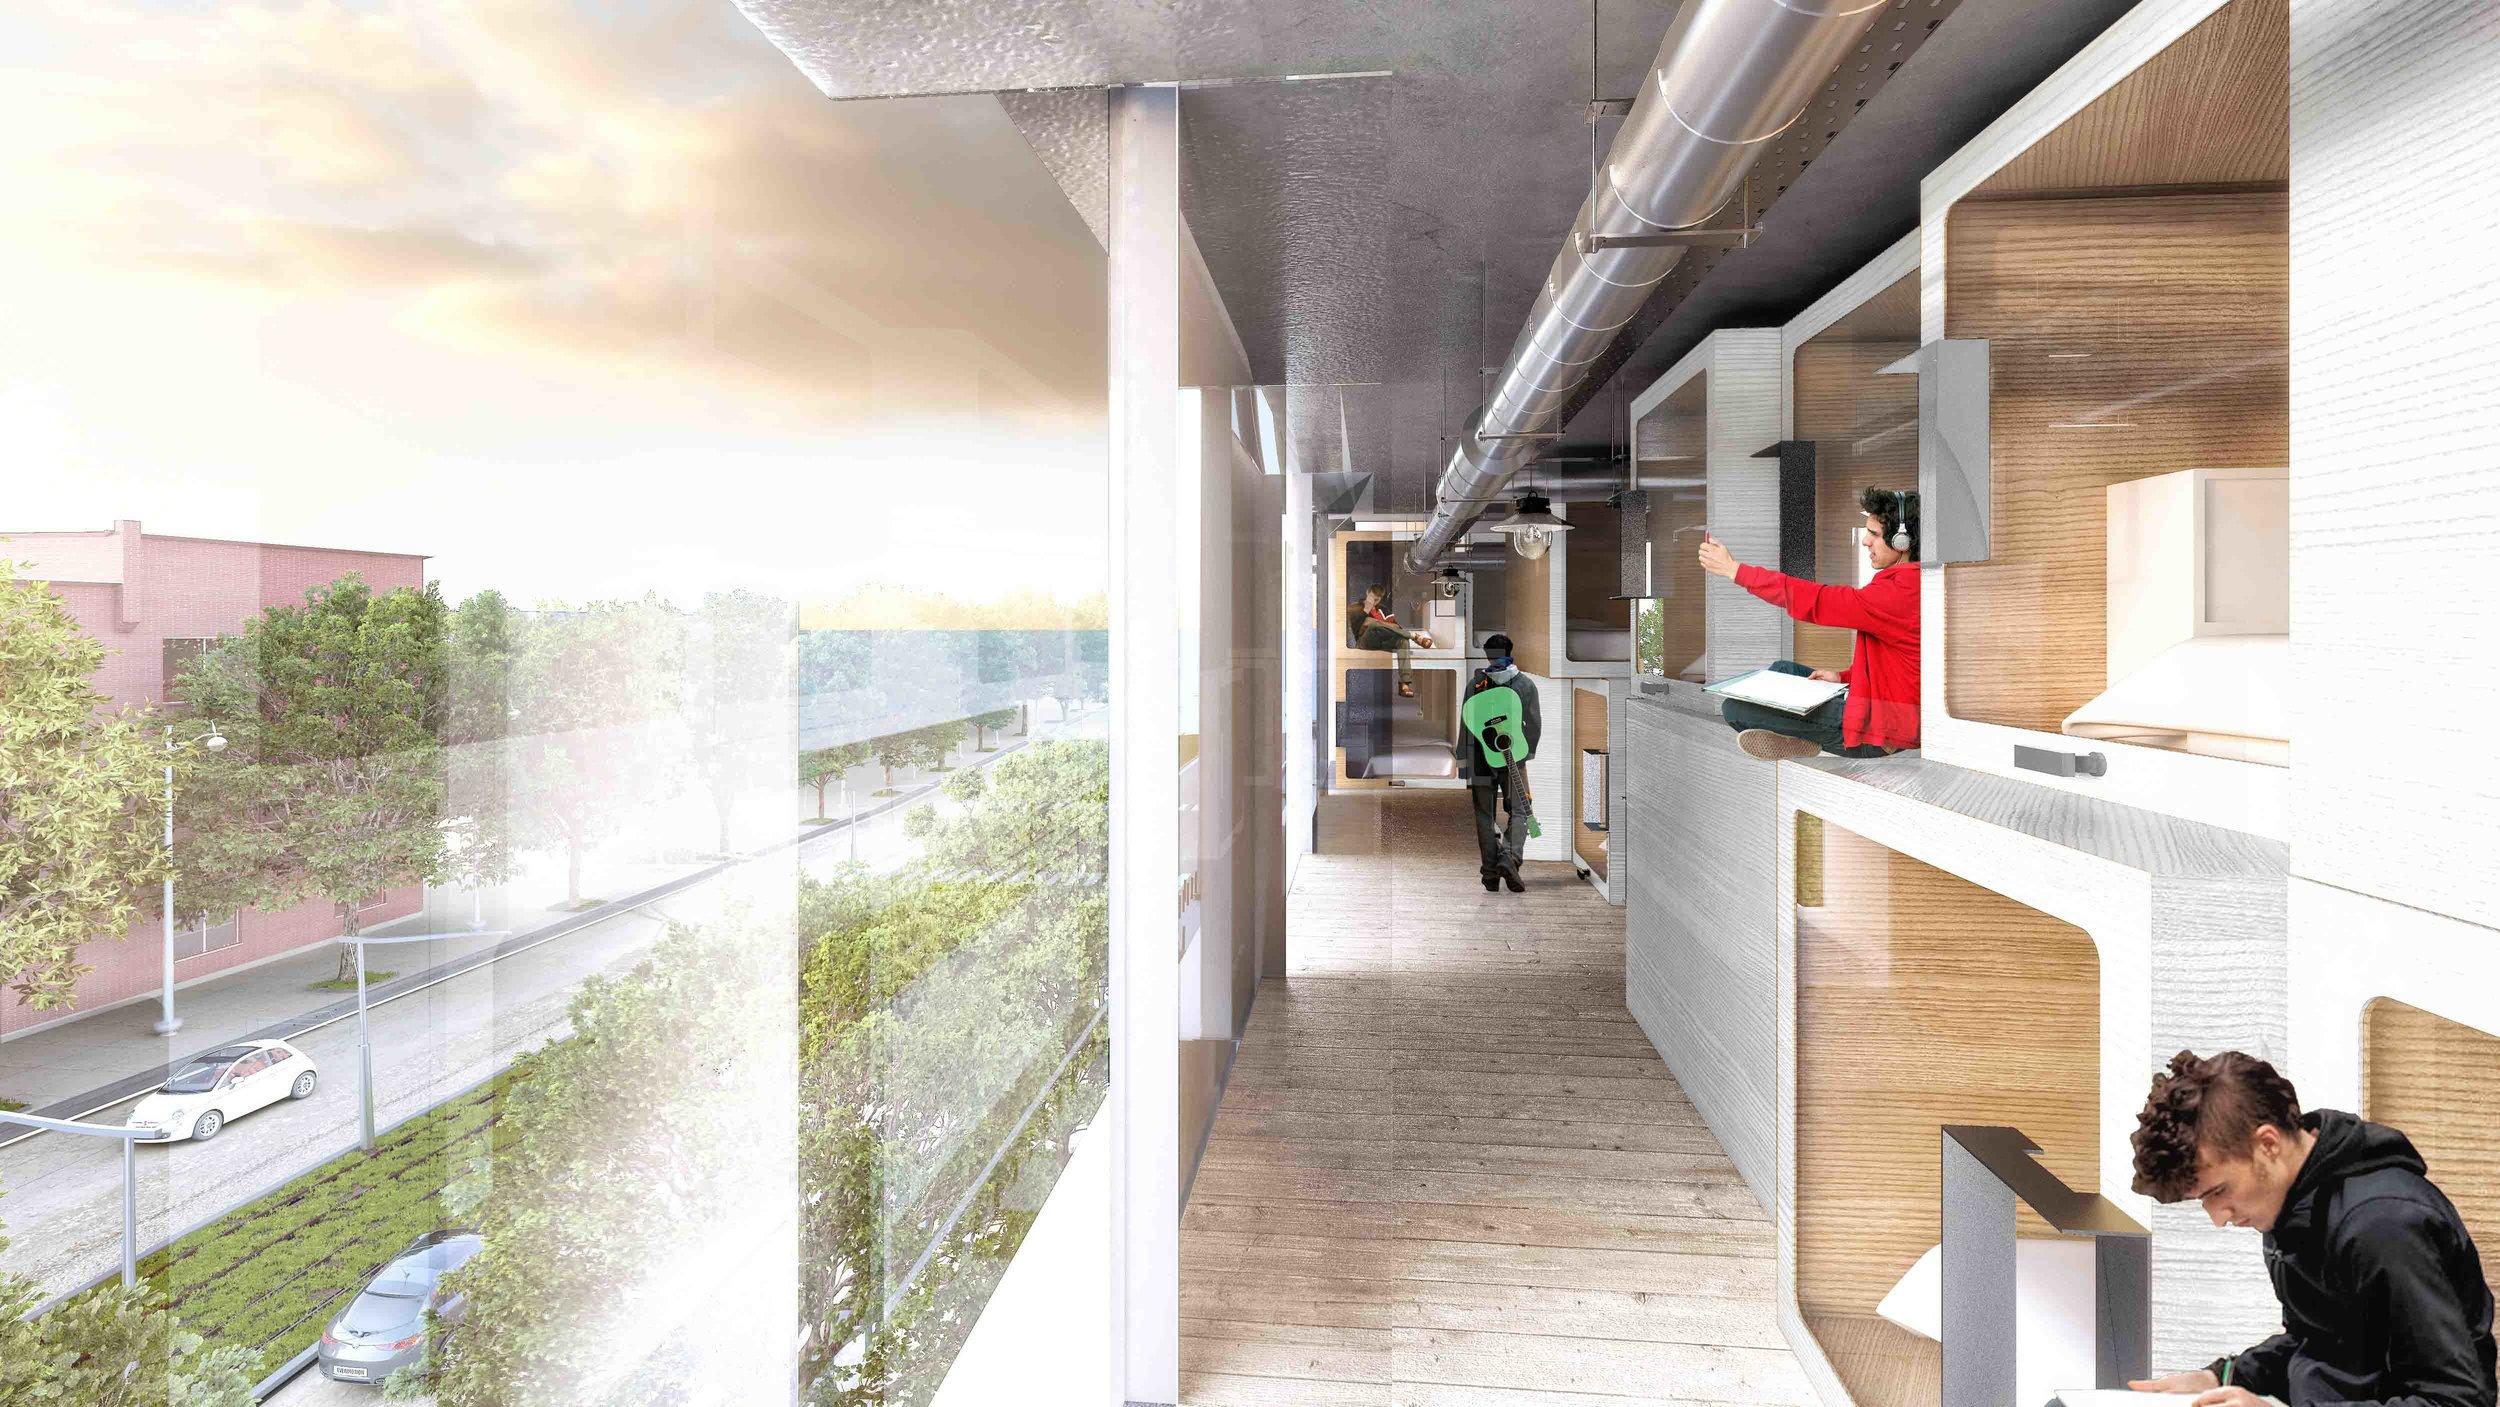 reinventer - paris- noc 42 - xavier - niel - ar - Studio - architectures - ecole 42   Kwame YAMGNANE nicolas sadirac - free (4).jpg